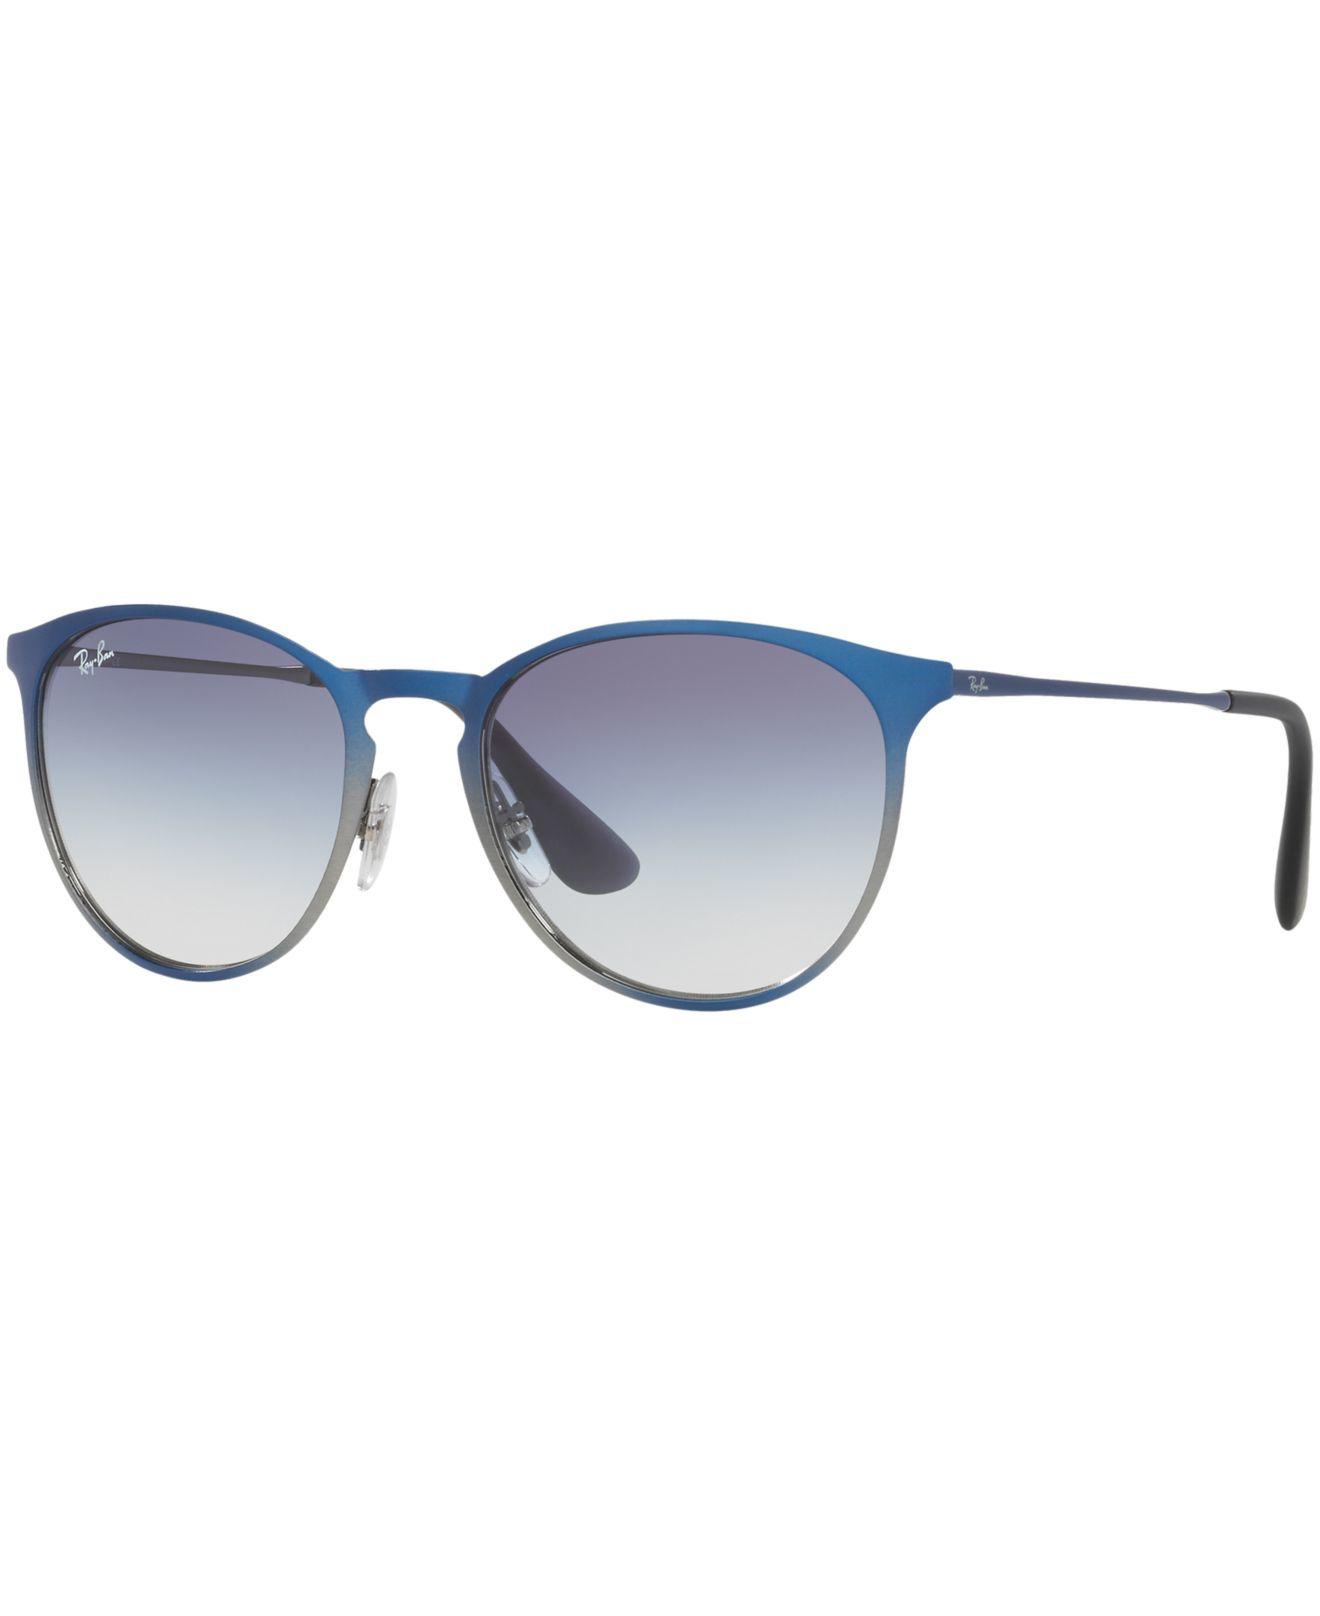 5d3911067f7 Mens Wayfair Sunglasses Ray Ban Amazon Package « Heritage Malta